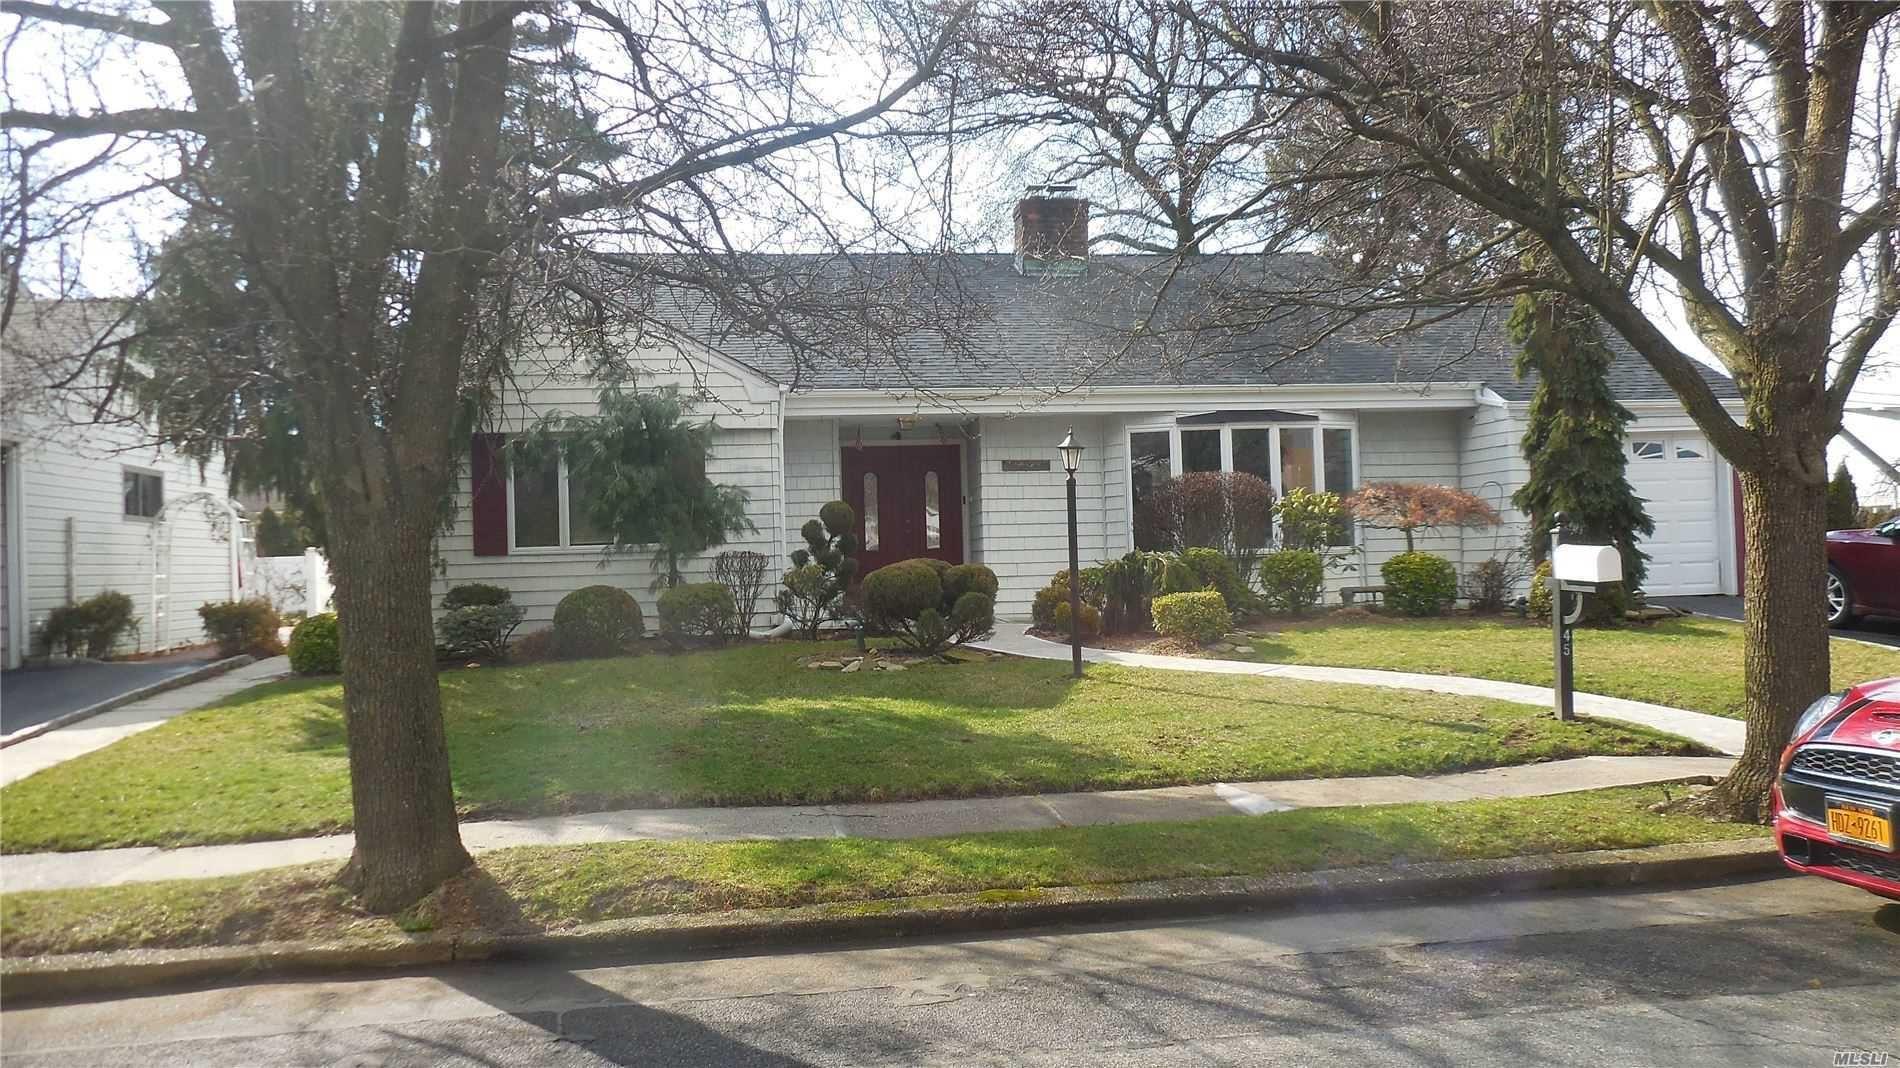 45 N King Street, Malverne, NY 11565 - MLS#: 3199787